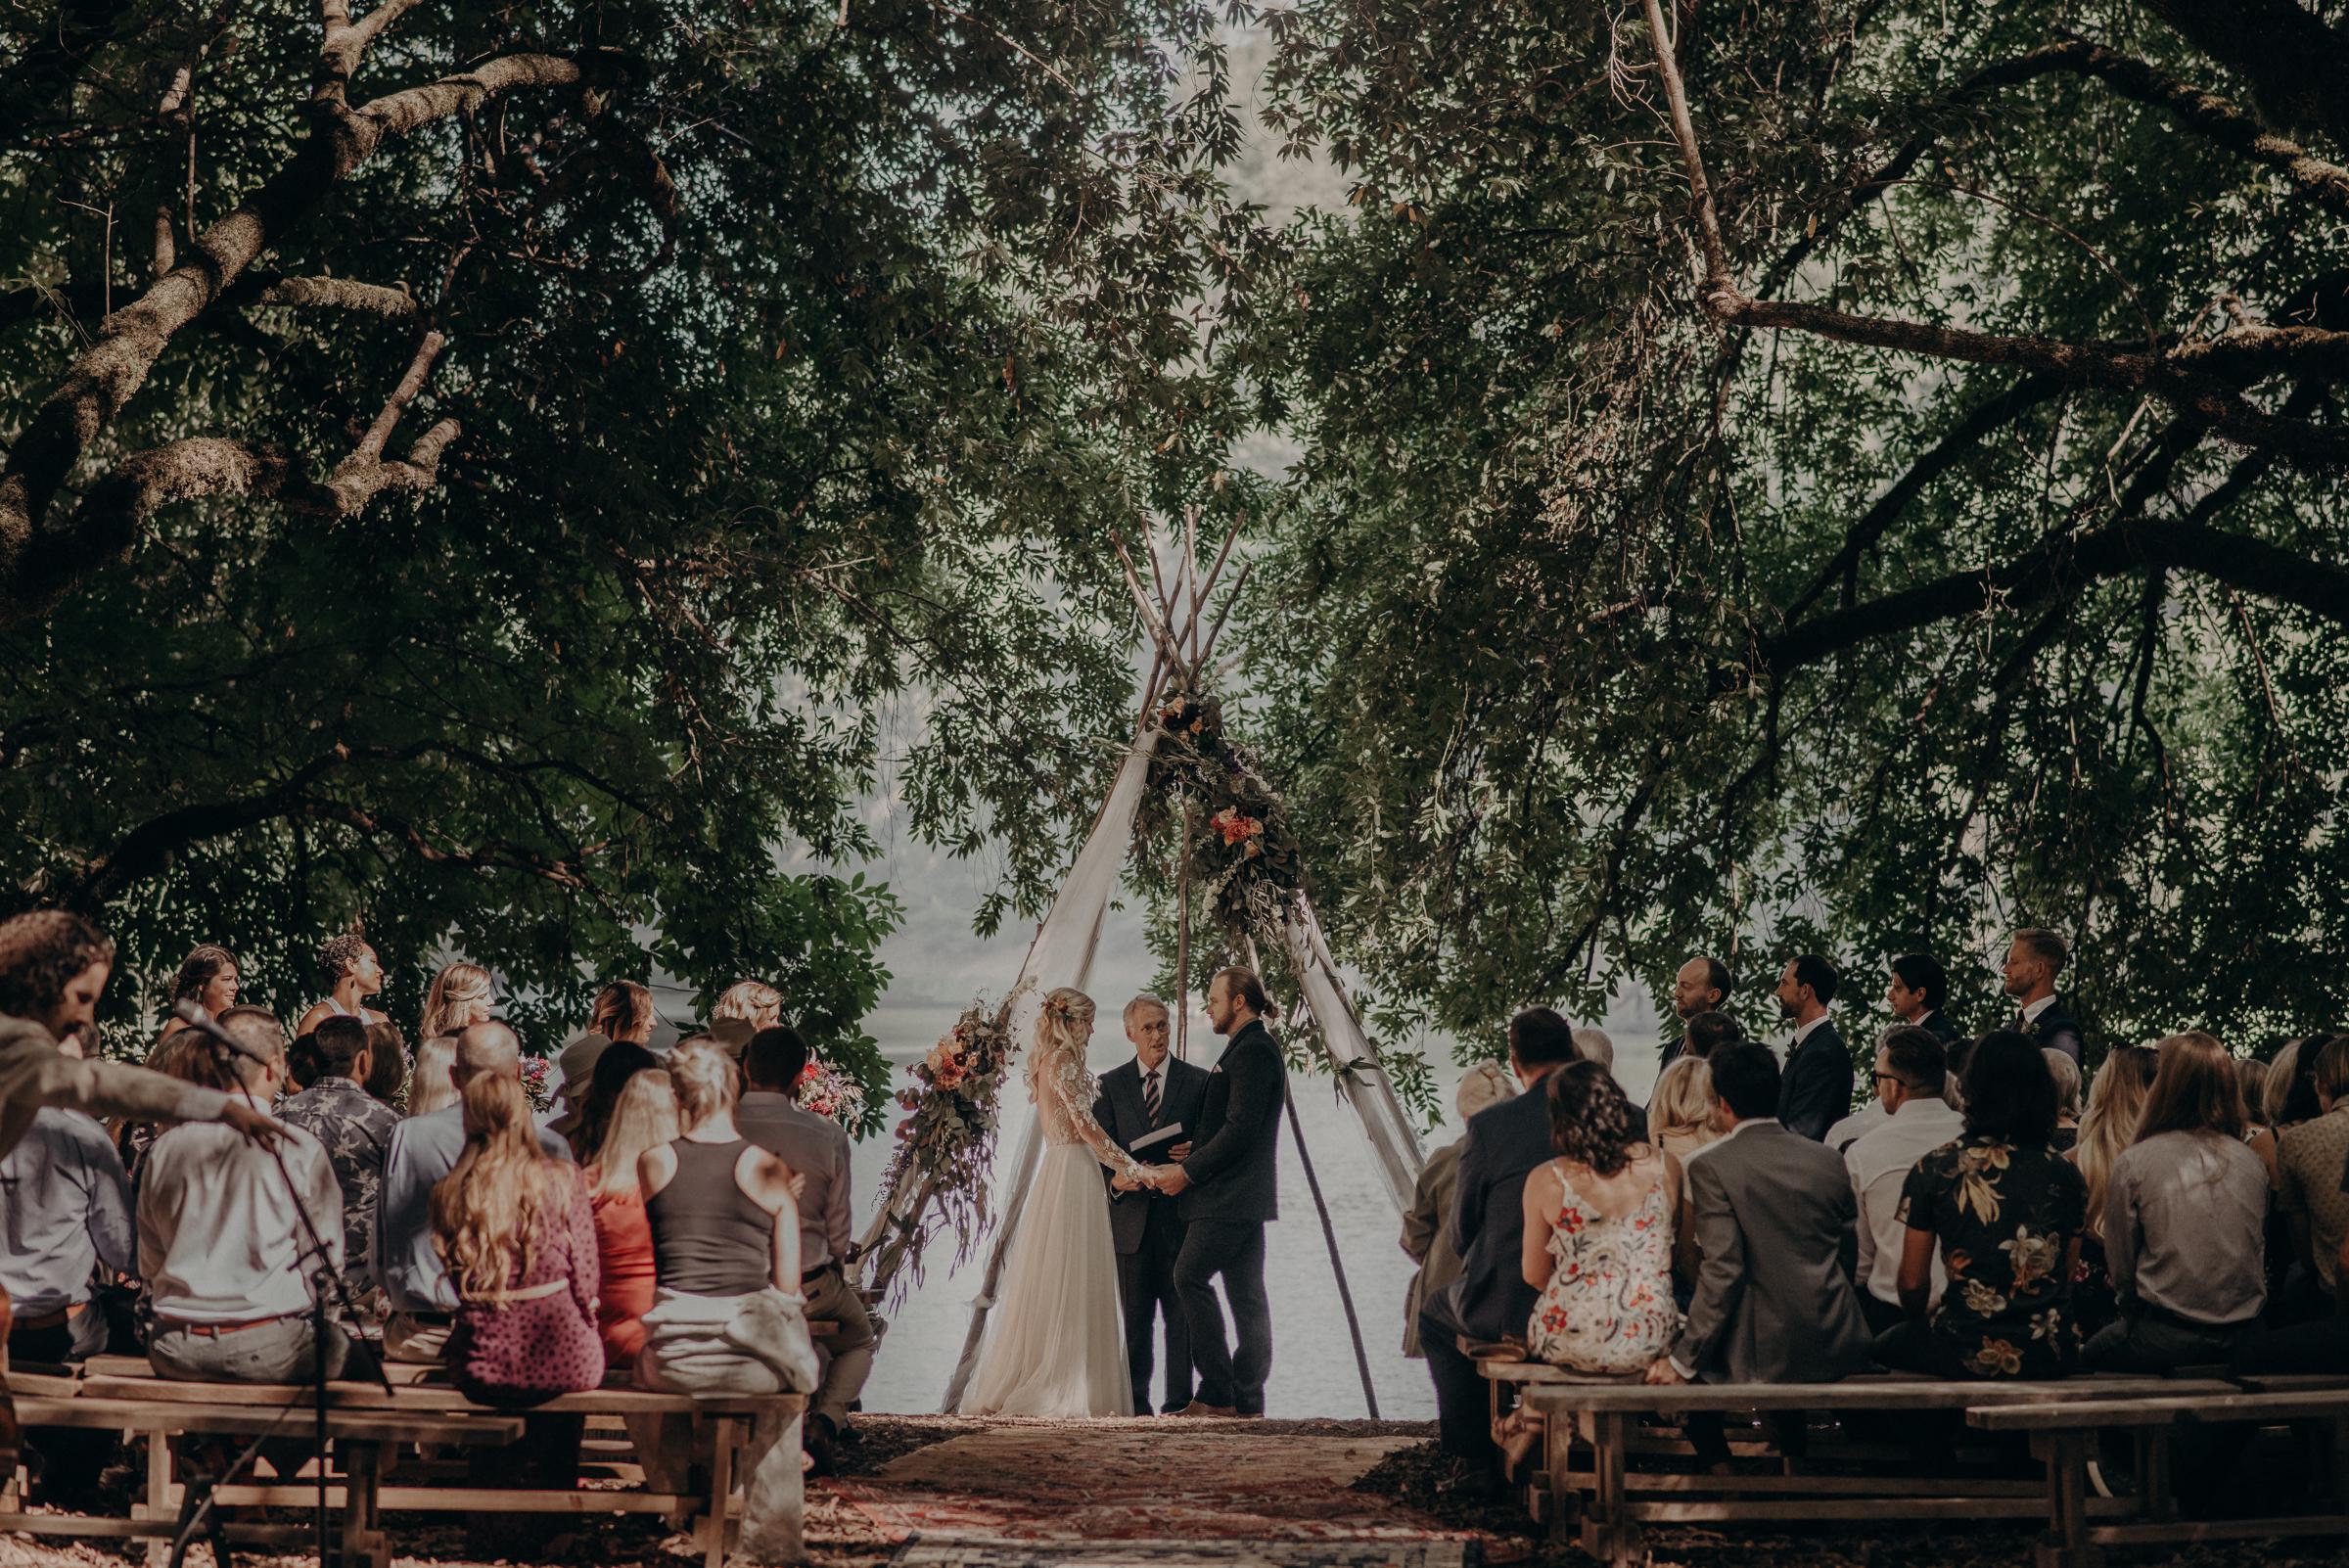 IsaiahAndTaylor.com - California Destination Elopement, Lake Leonard Reserve Wedding, Ukiah-102.jpg